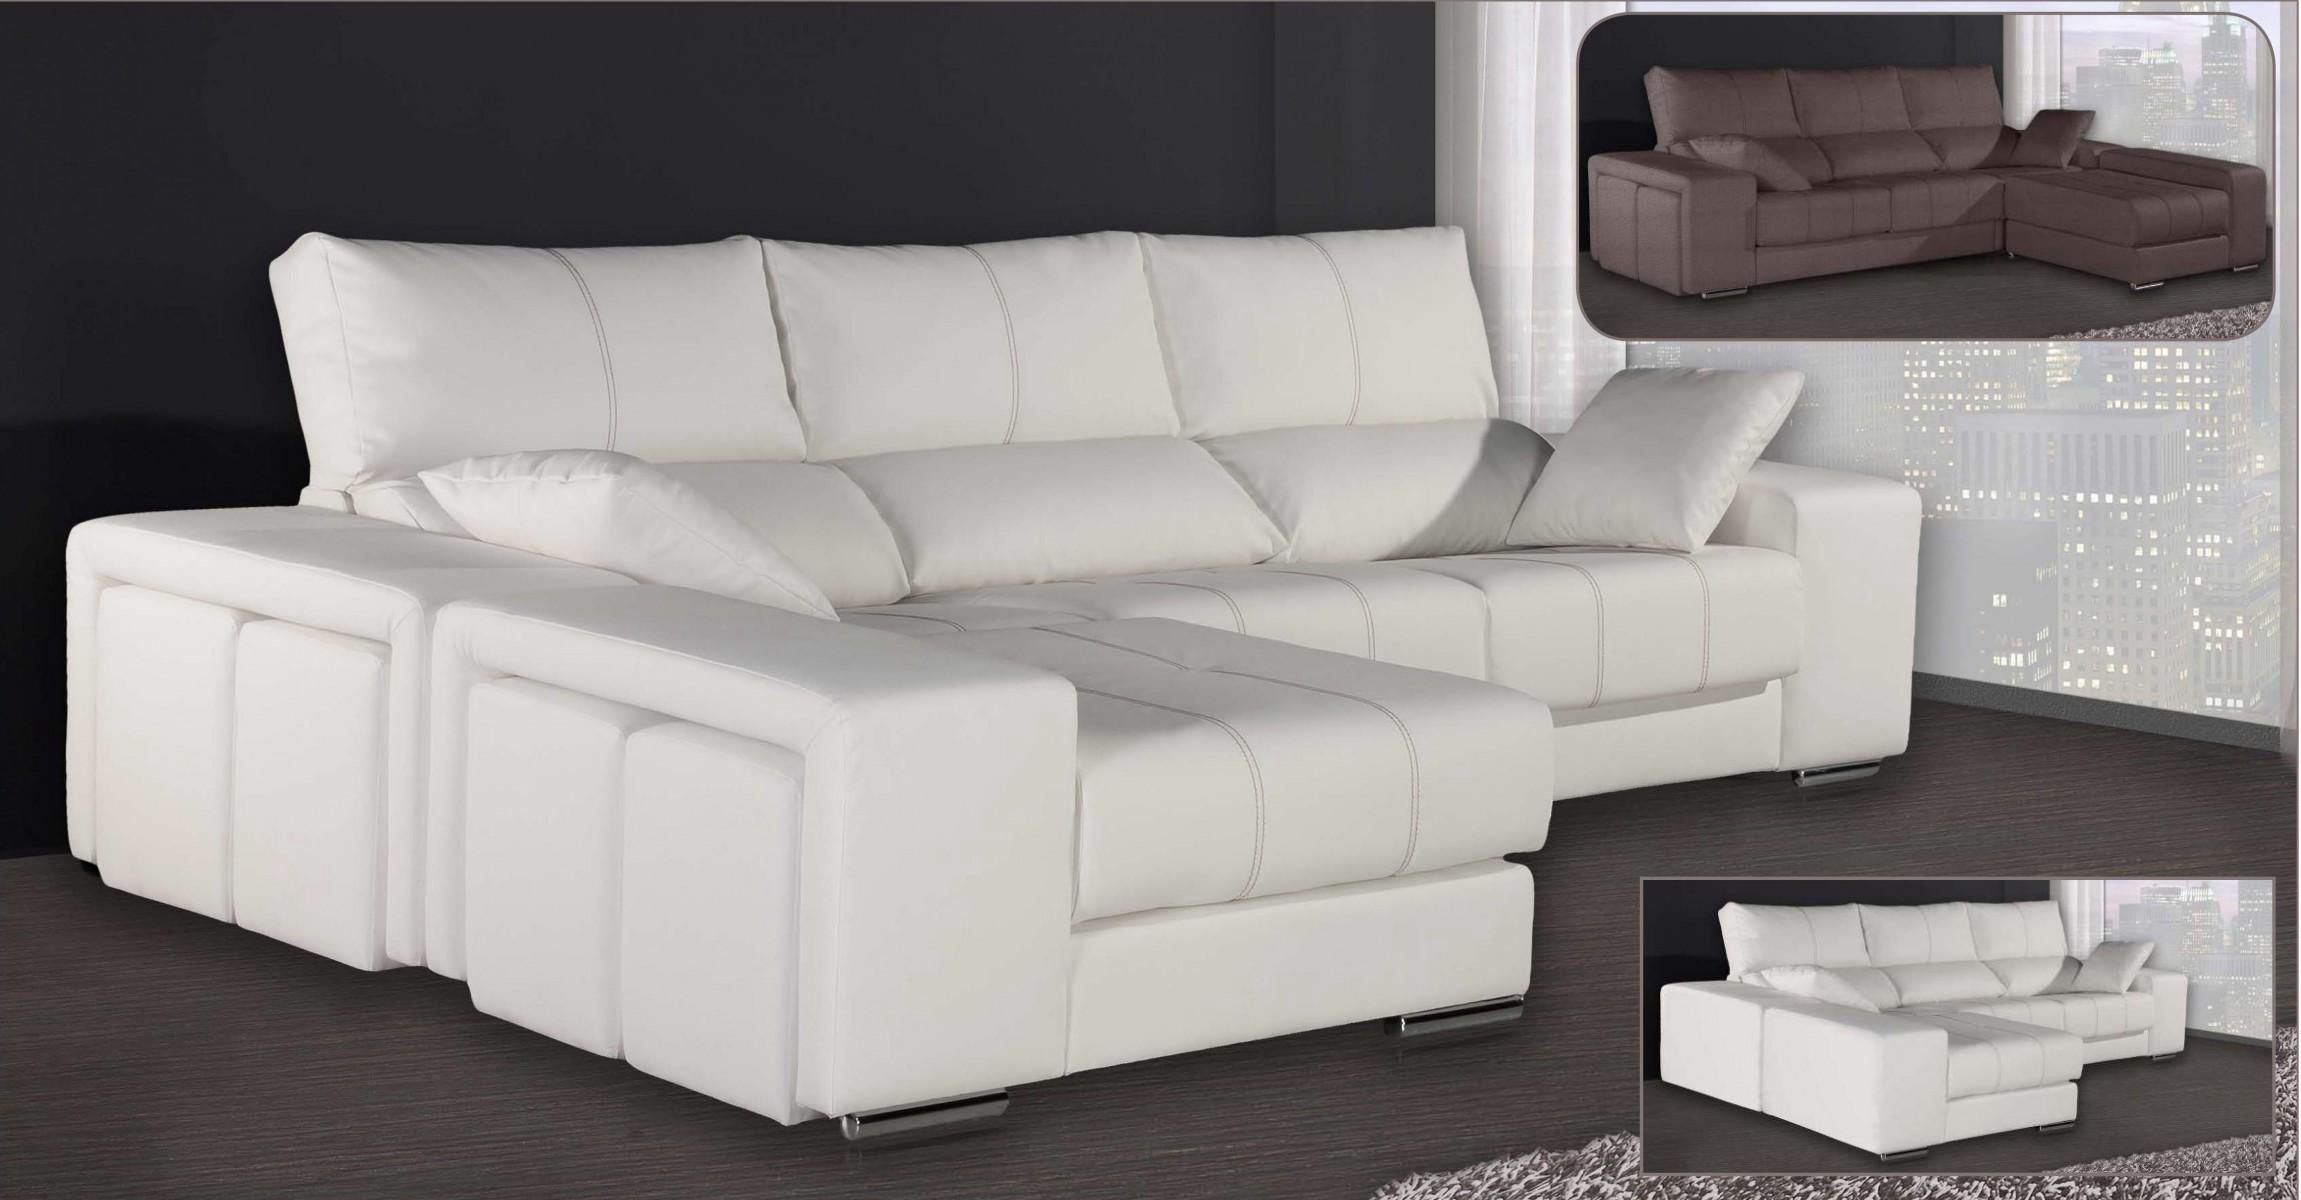 Sof s chaise longue 3 y 2 relax mobles sedavi tienda for Sillones chaise longue